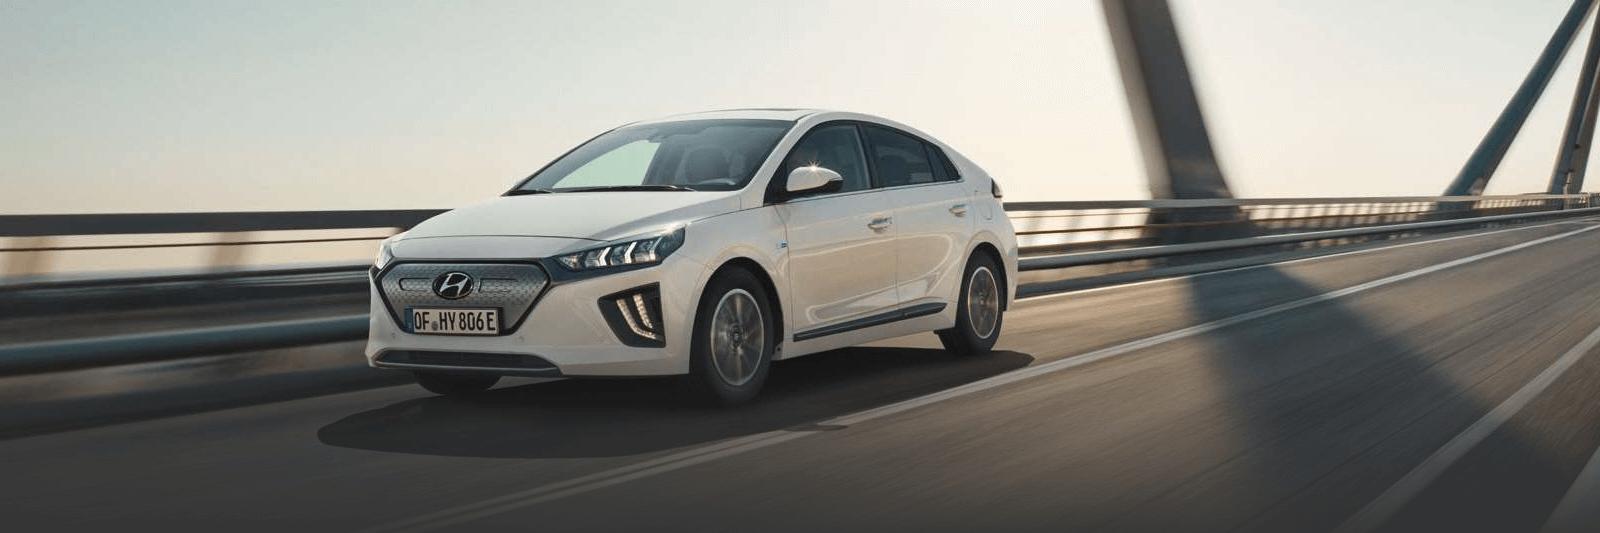 Nye Hyundai IONIQ Electric 38,3kWt